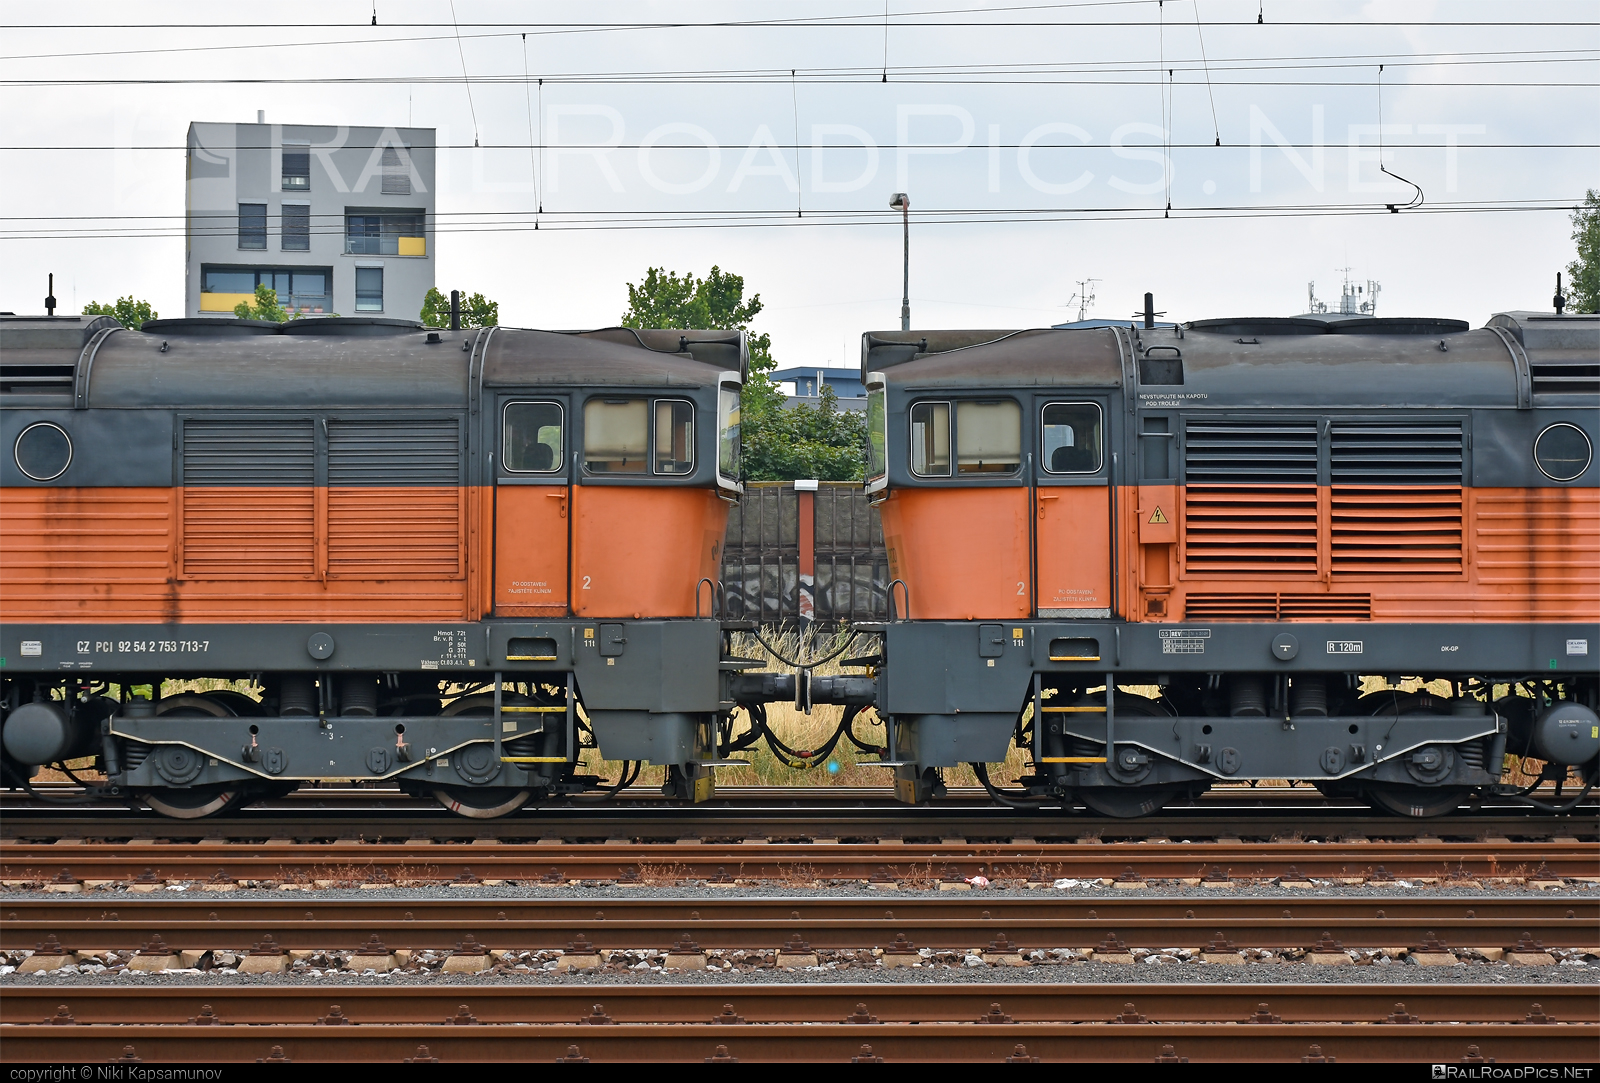 ČKD T 478.3 (753) - 753 713-7 operated by PKP CARGO INTERNATIONAL a.s. #brejlovec #ckd #ckdclass753 #ckdt4783 #locomotive753 #okuliarnik #pkpcargointernational #pkpcargointernationalas